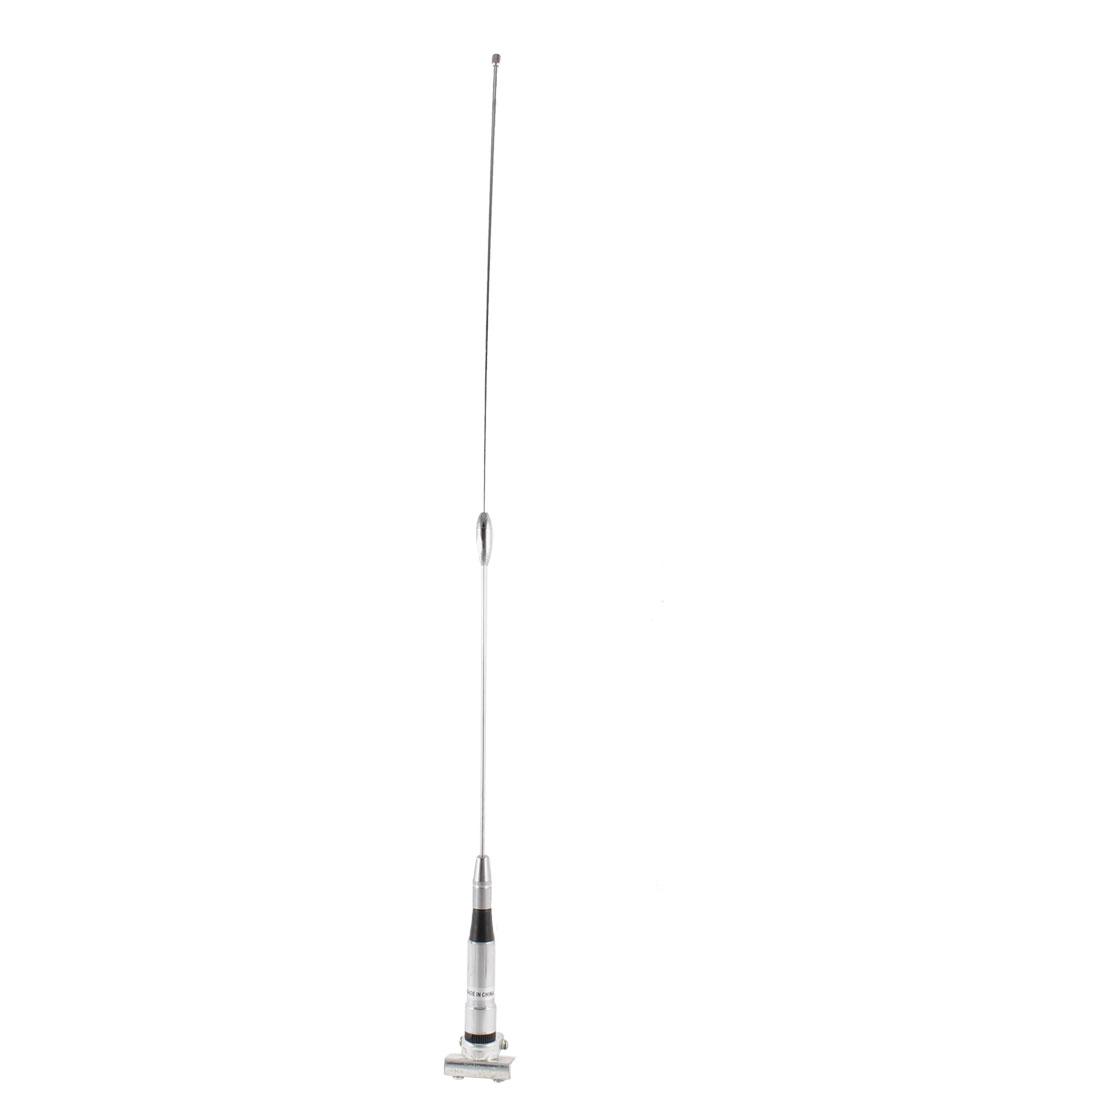 58cm Long Silver Tone Screw Mount Single Pole Car Auto Signal Radio FM AM Antenna